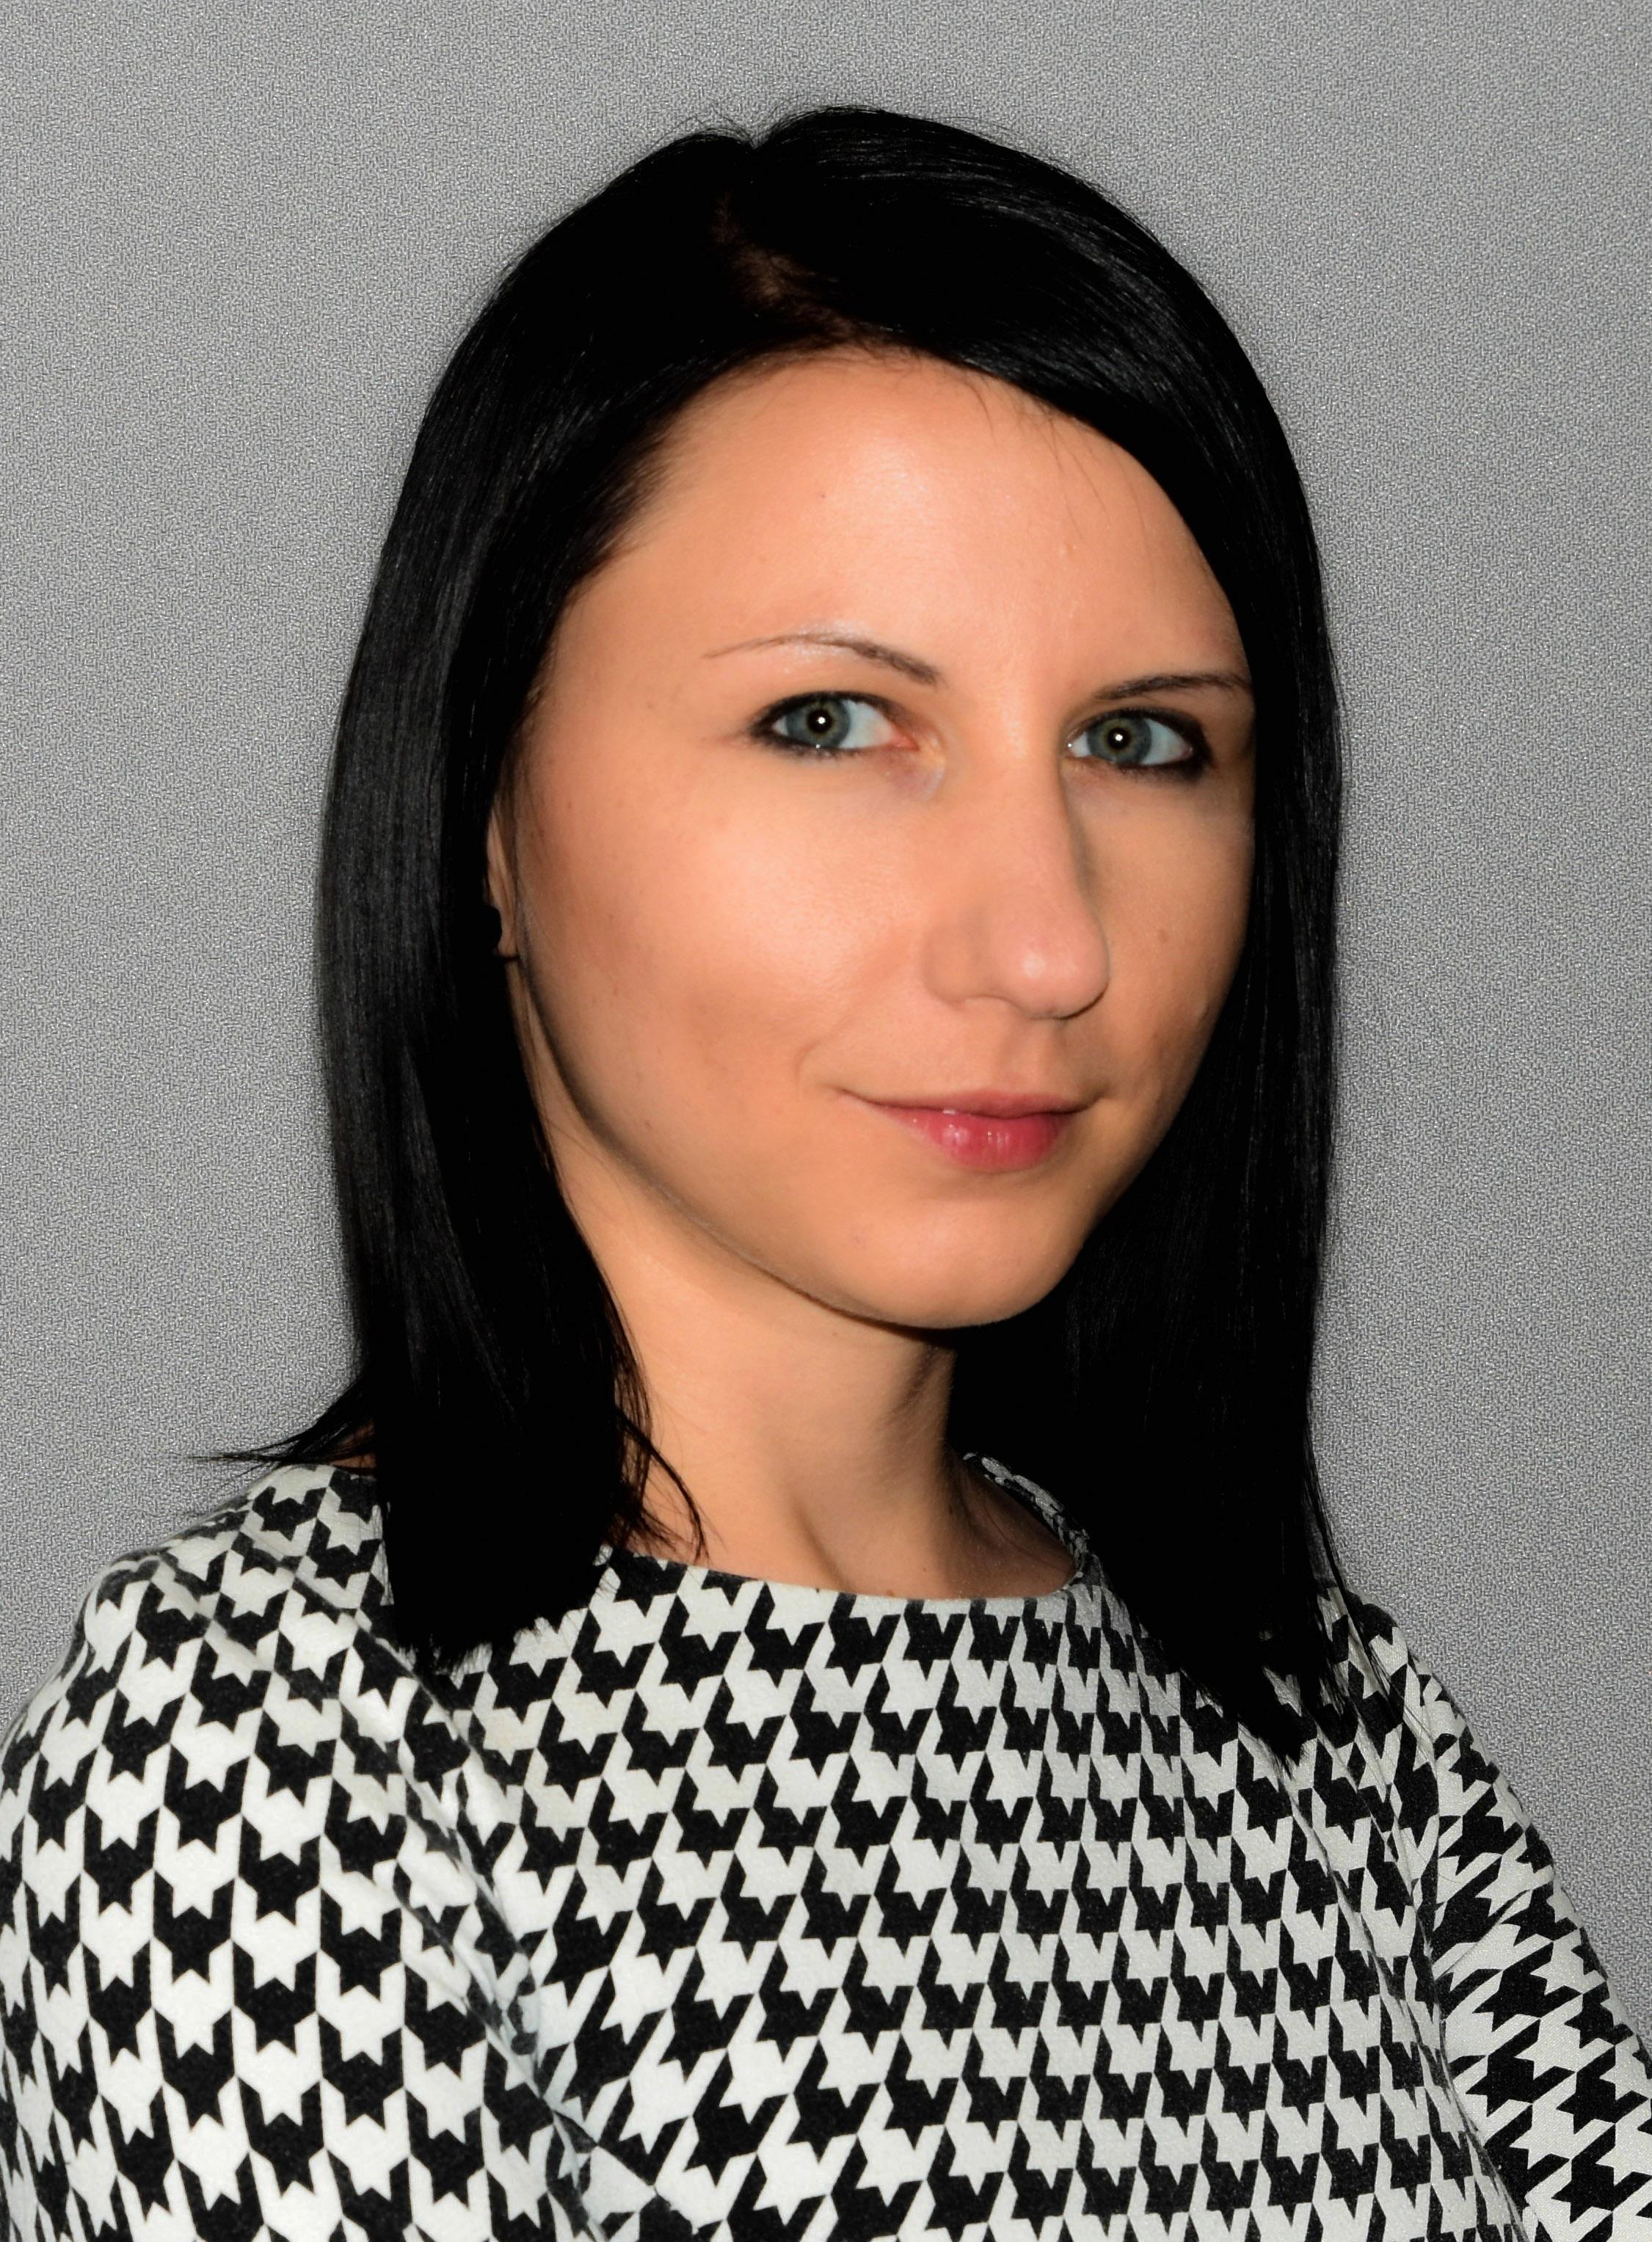 Claudia Kausch